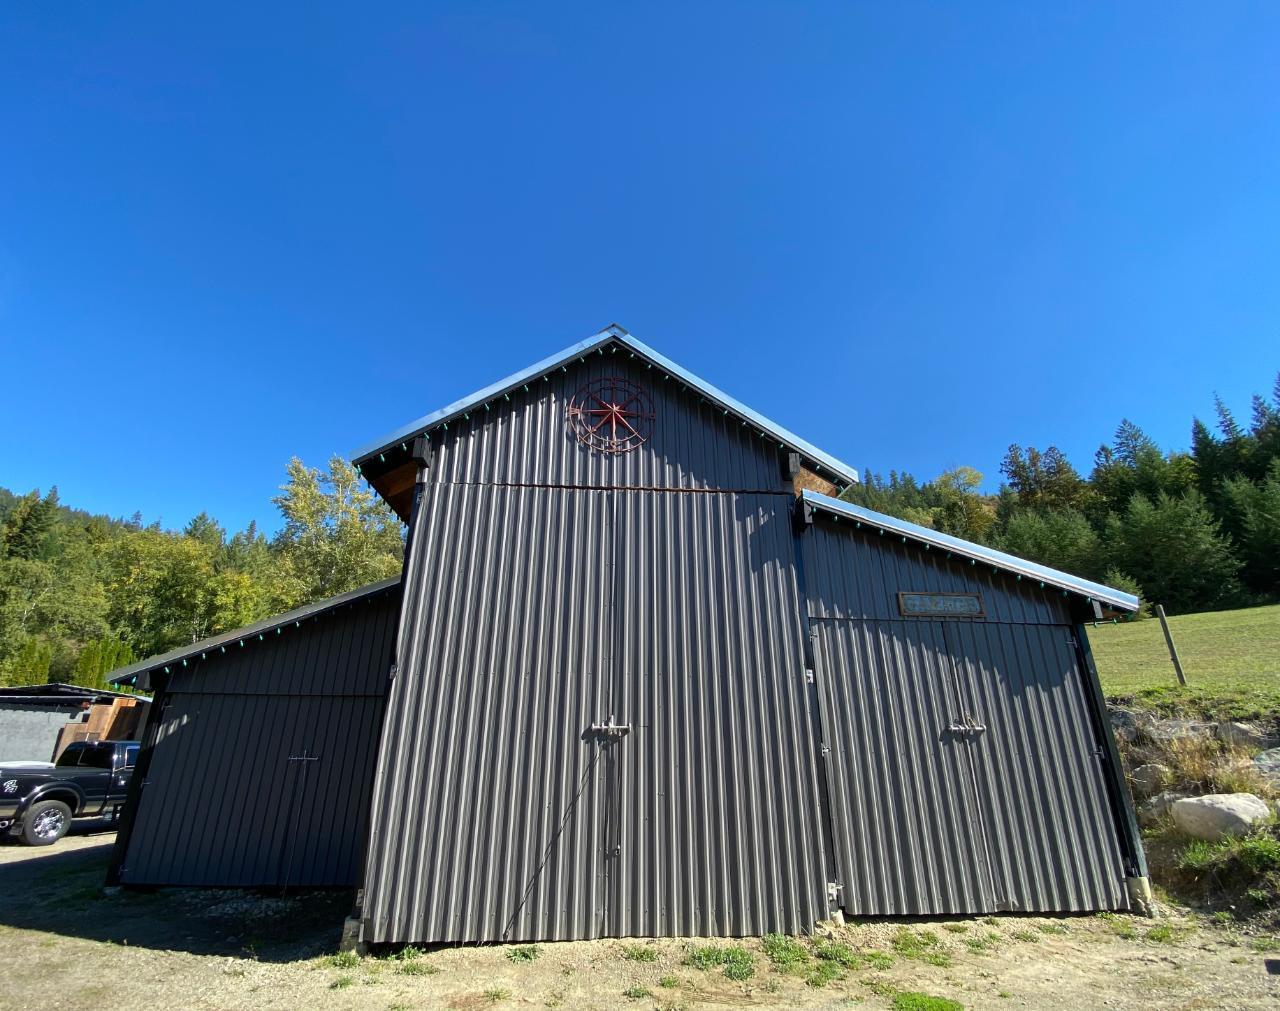 2505 Barley Road, Rossland, British Columbia  V0G 1Y0 - Photo 94 - 2461148